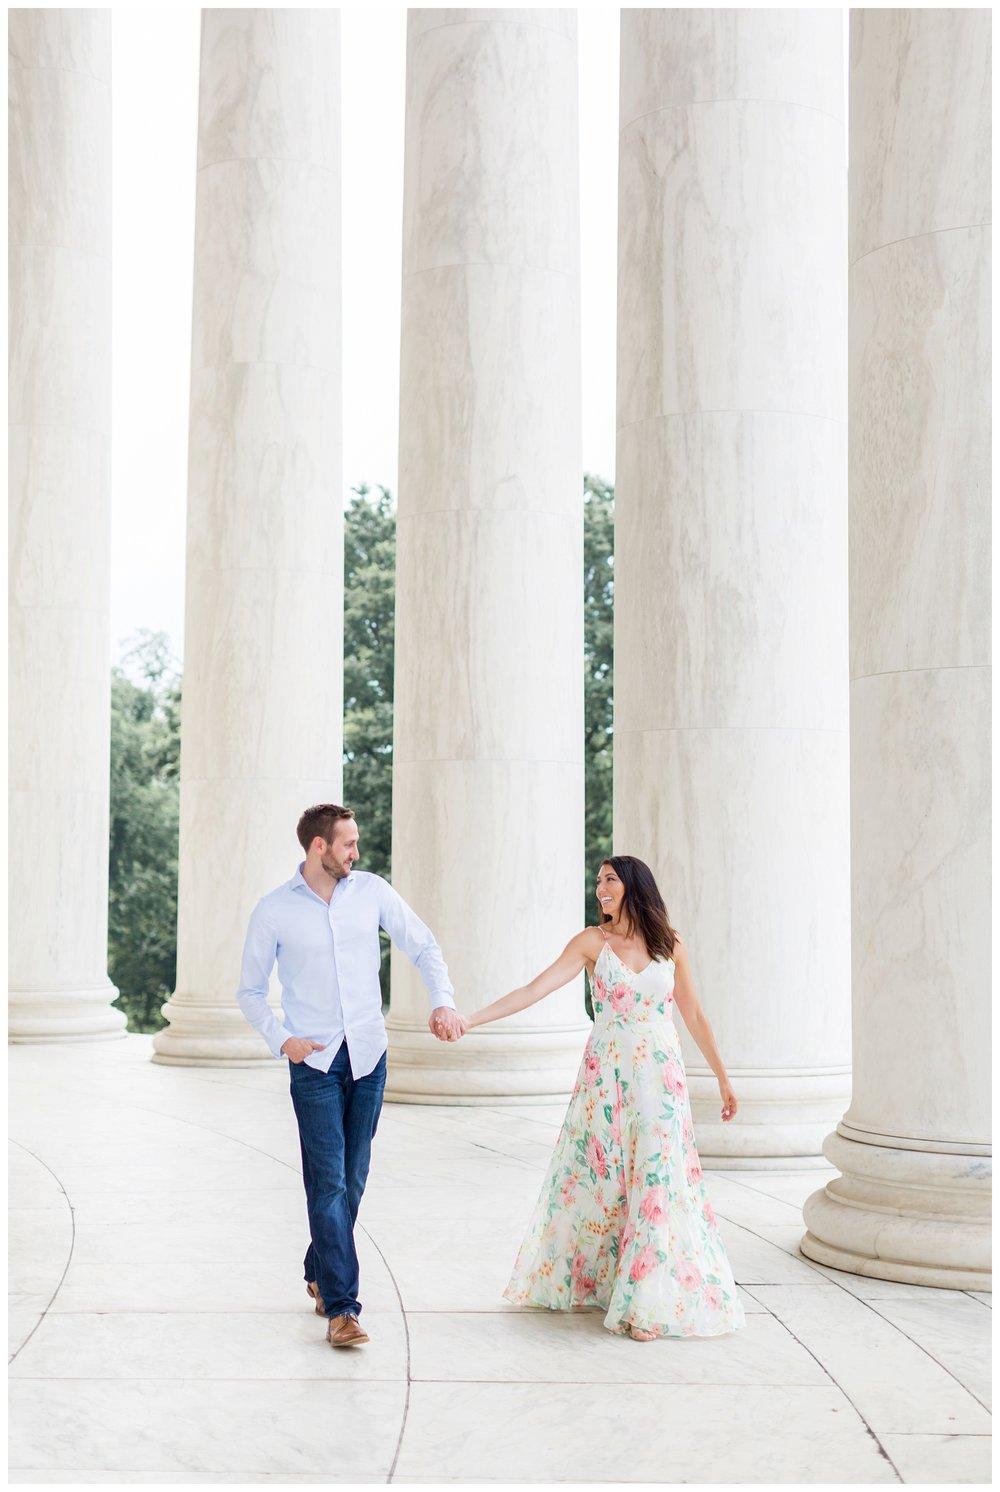 Washington DC Engagement Photos District of Columbia Wedding Photographer_0030.jpg